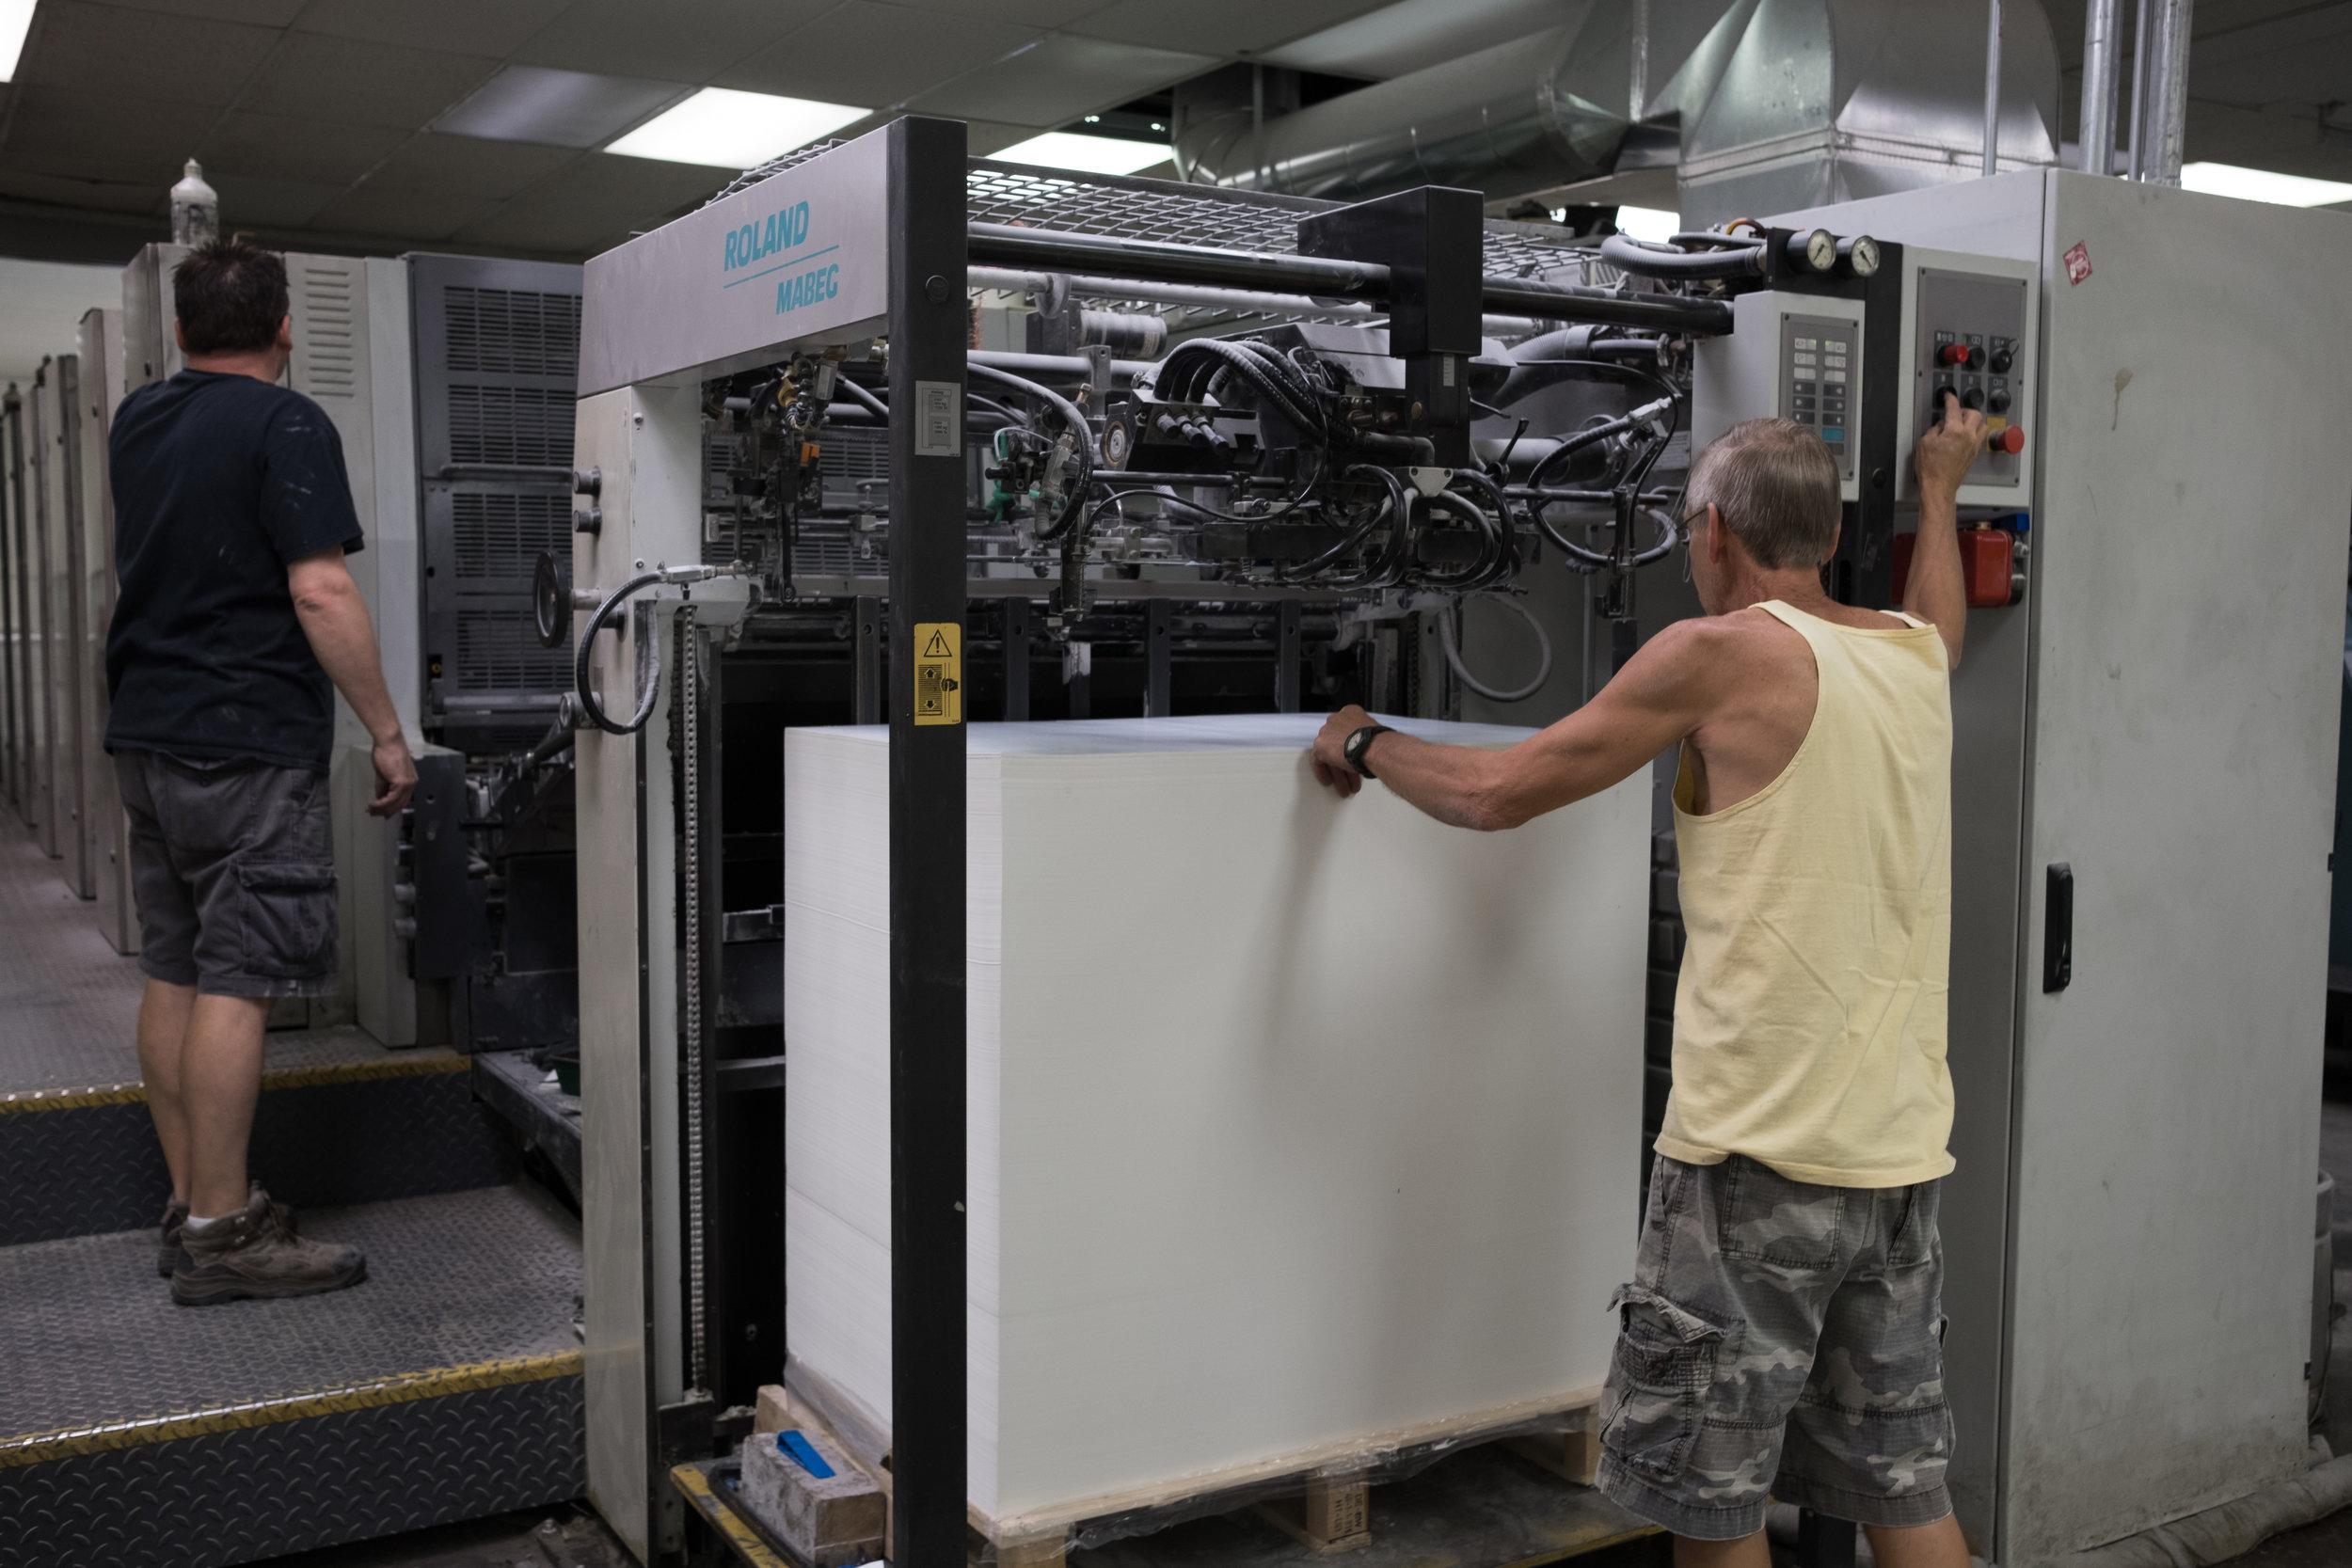 Loading paper to start a print run